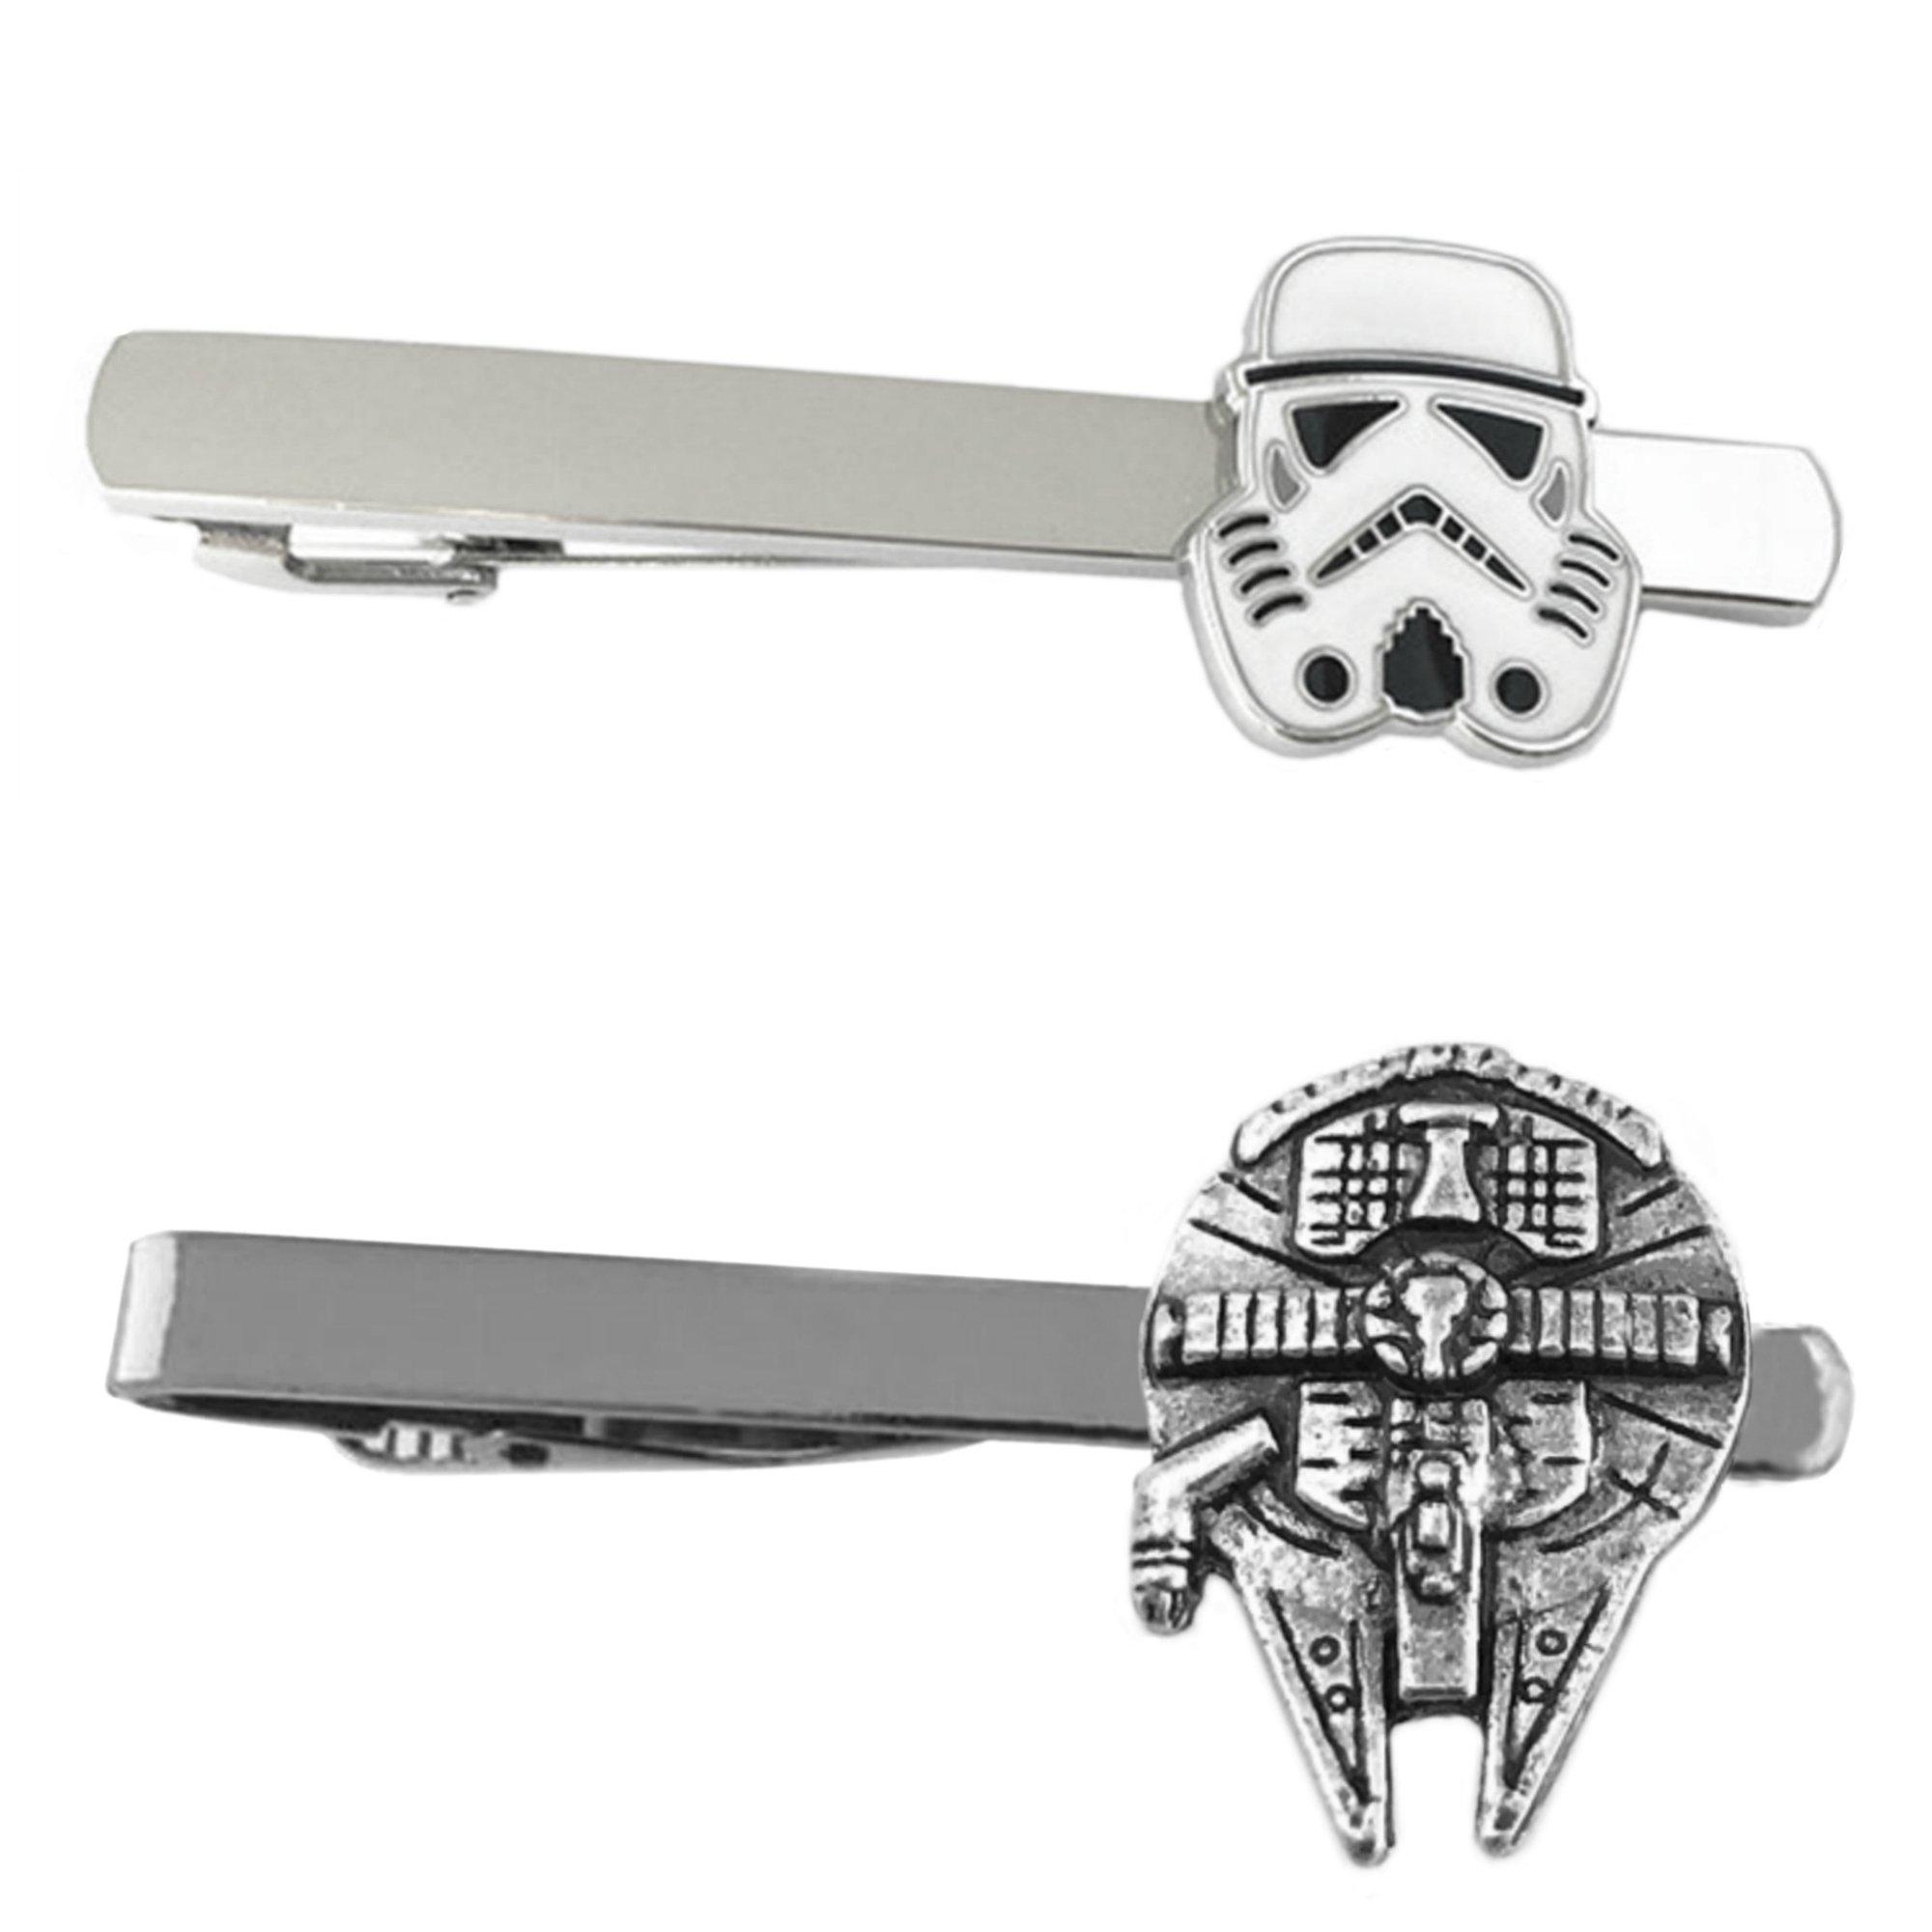 Outlander Star Wars - Storm Trooper & Millenium Falcon - Tiebar Tie Clasp Set of 2 Wedding Superhero Logo w/Gift Box